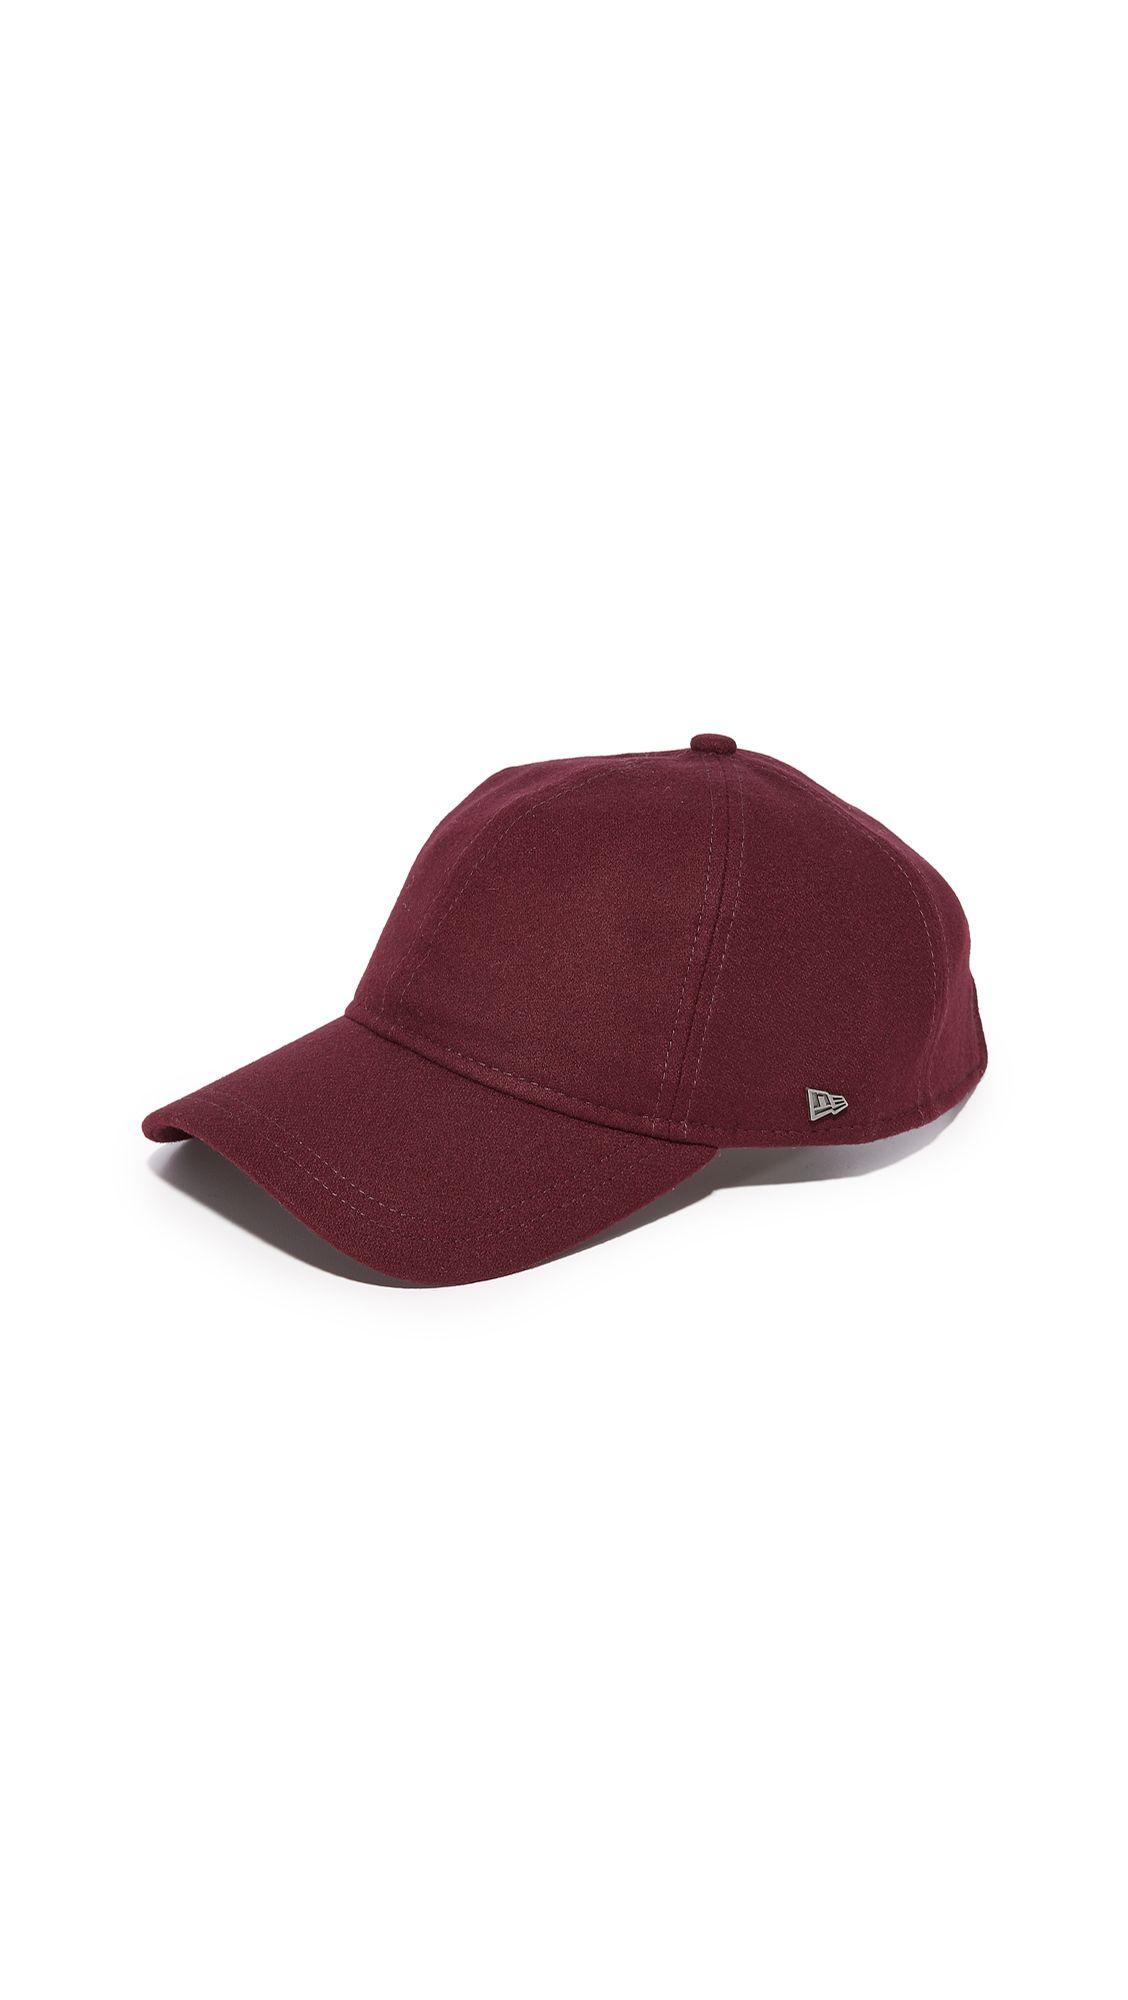 44ad19b21225c6 NEW ERA Essential 9Twenty Cap.  newera  cap